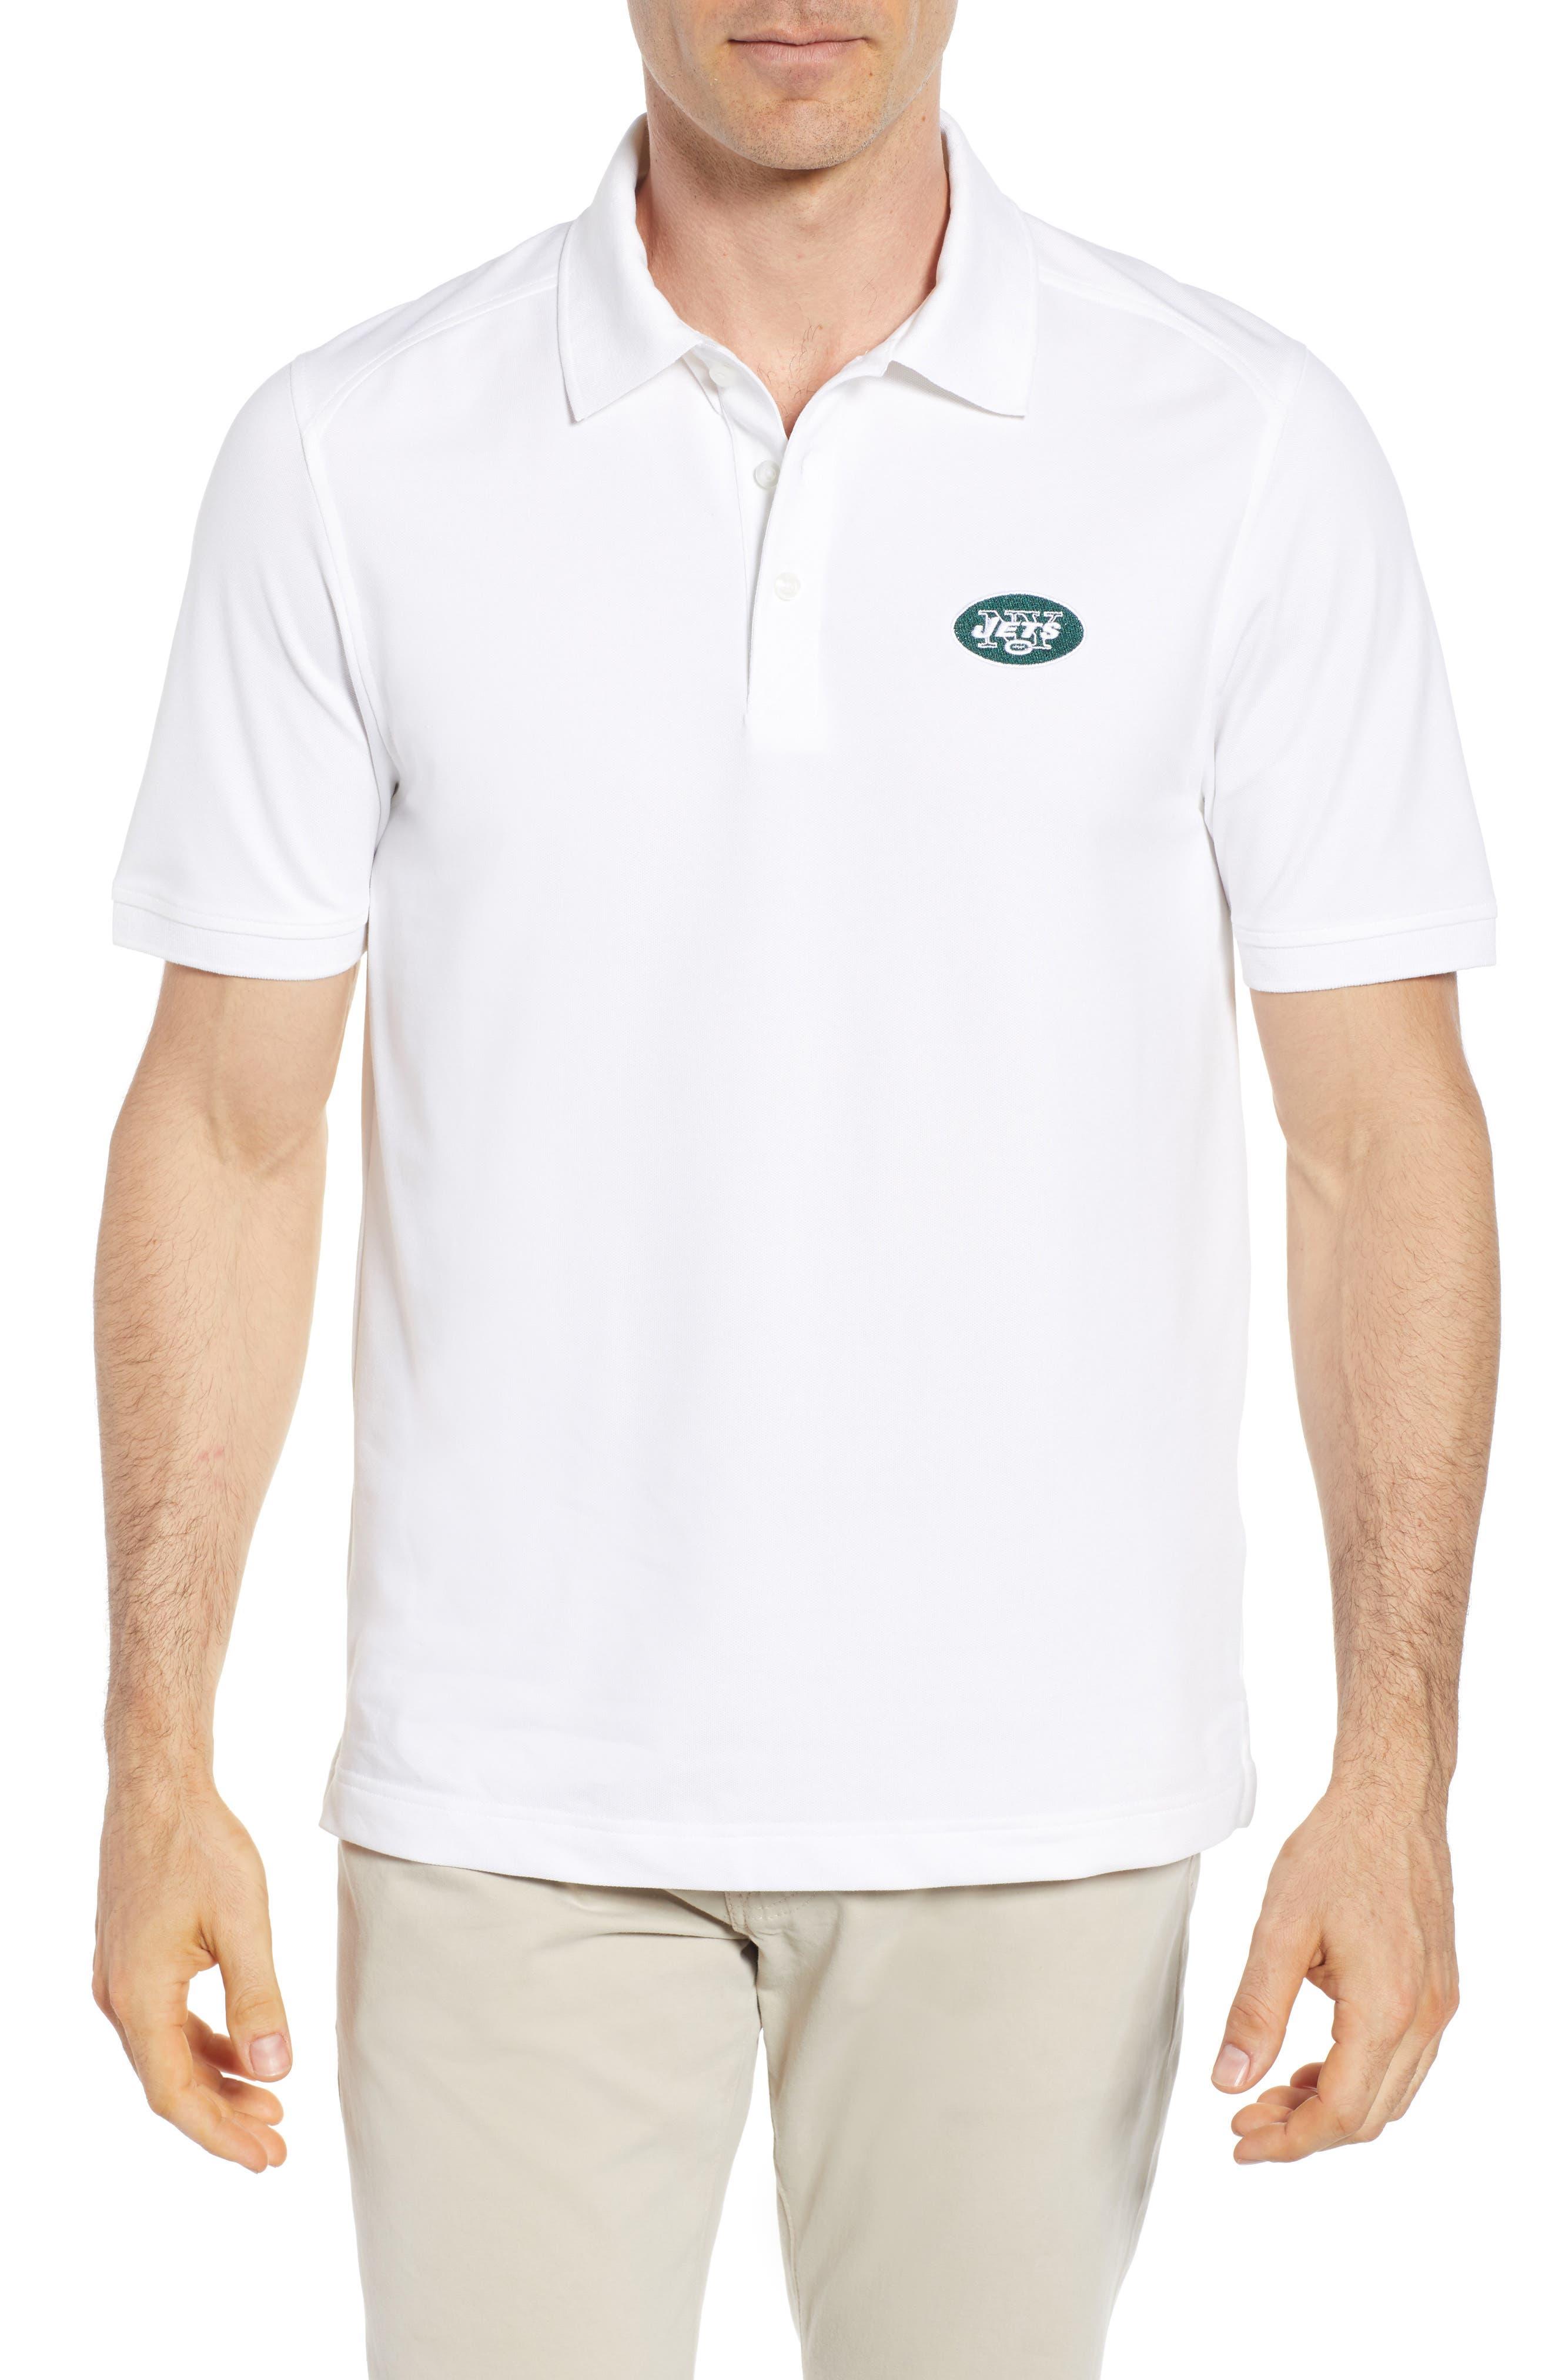 CUTTER & BUCK New York Jets - Advantage Regular Fit DryTec Polo, Main, color, 100